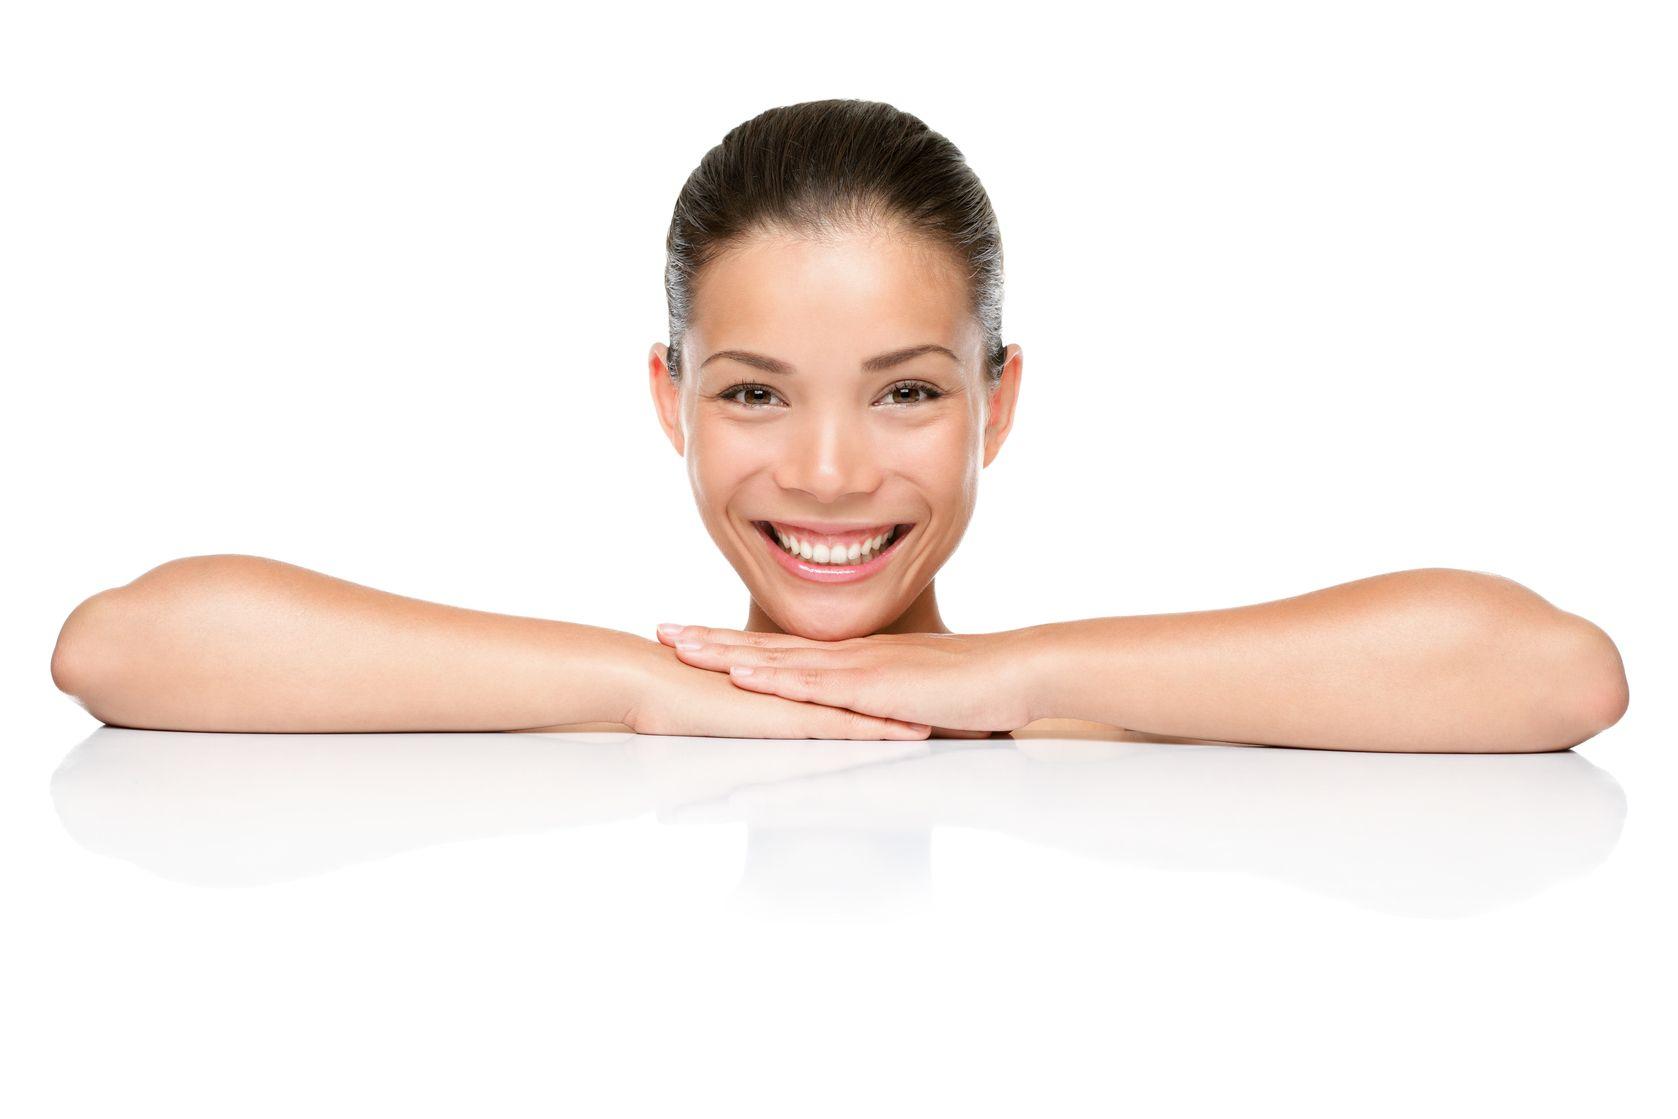 ویتامین ب6 - نقش ویتامین ب6 در سلامت پوست